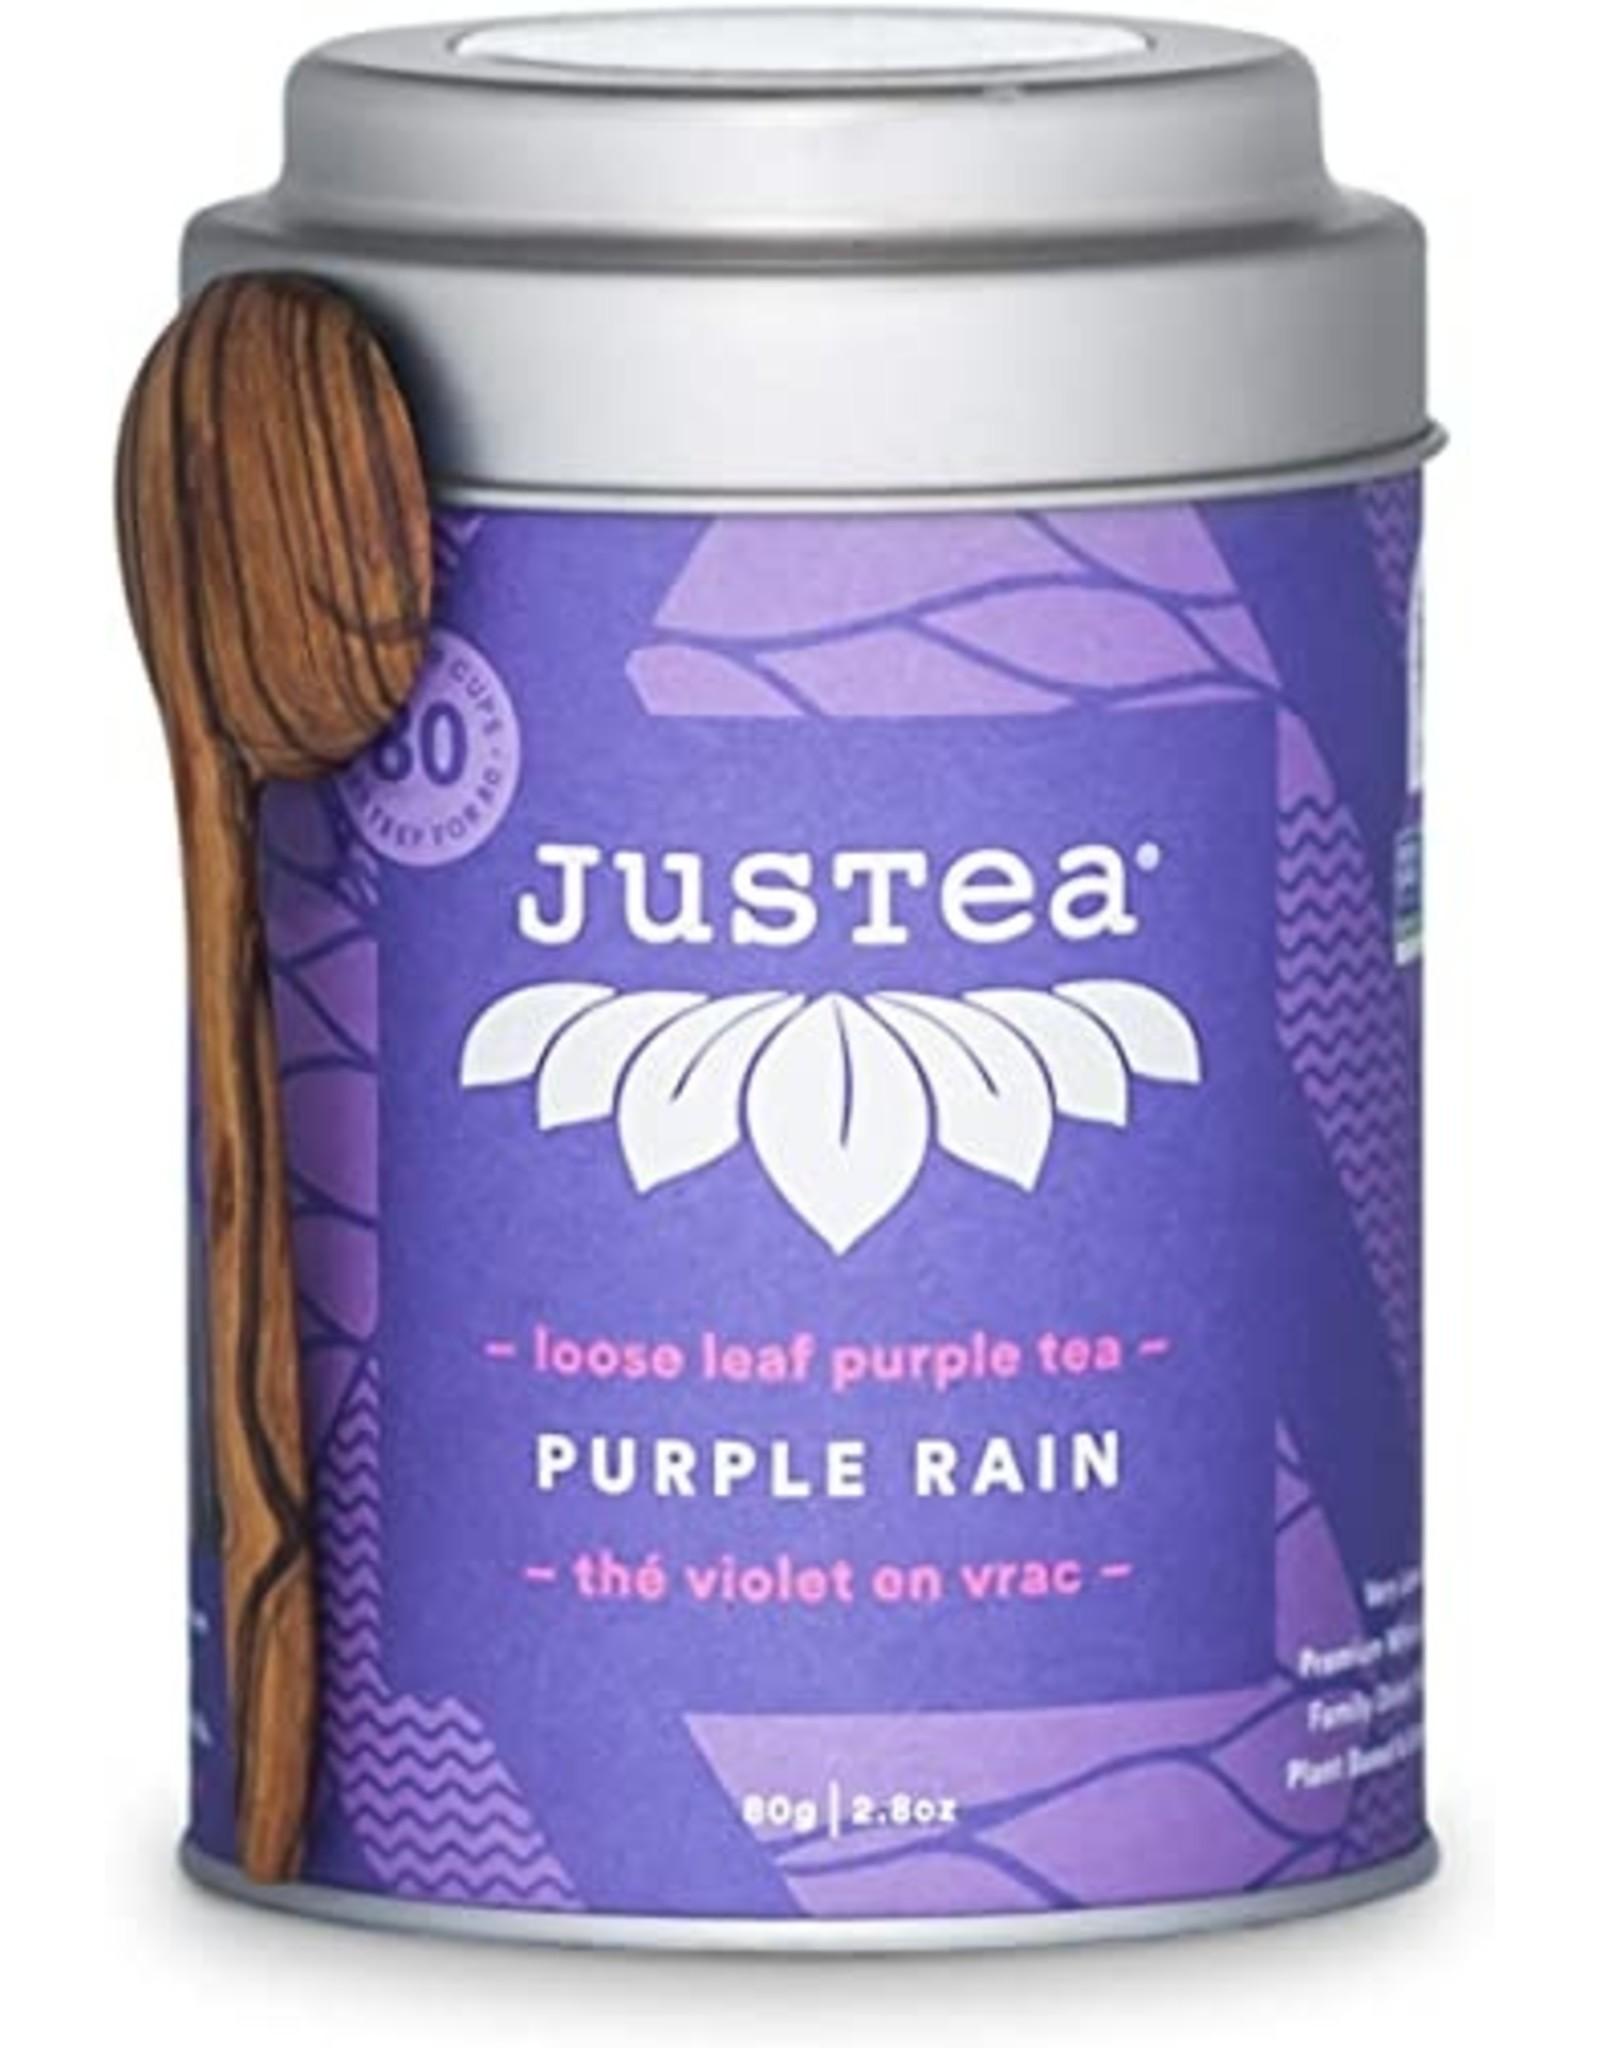 JusTea JusTea - Purple Rain